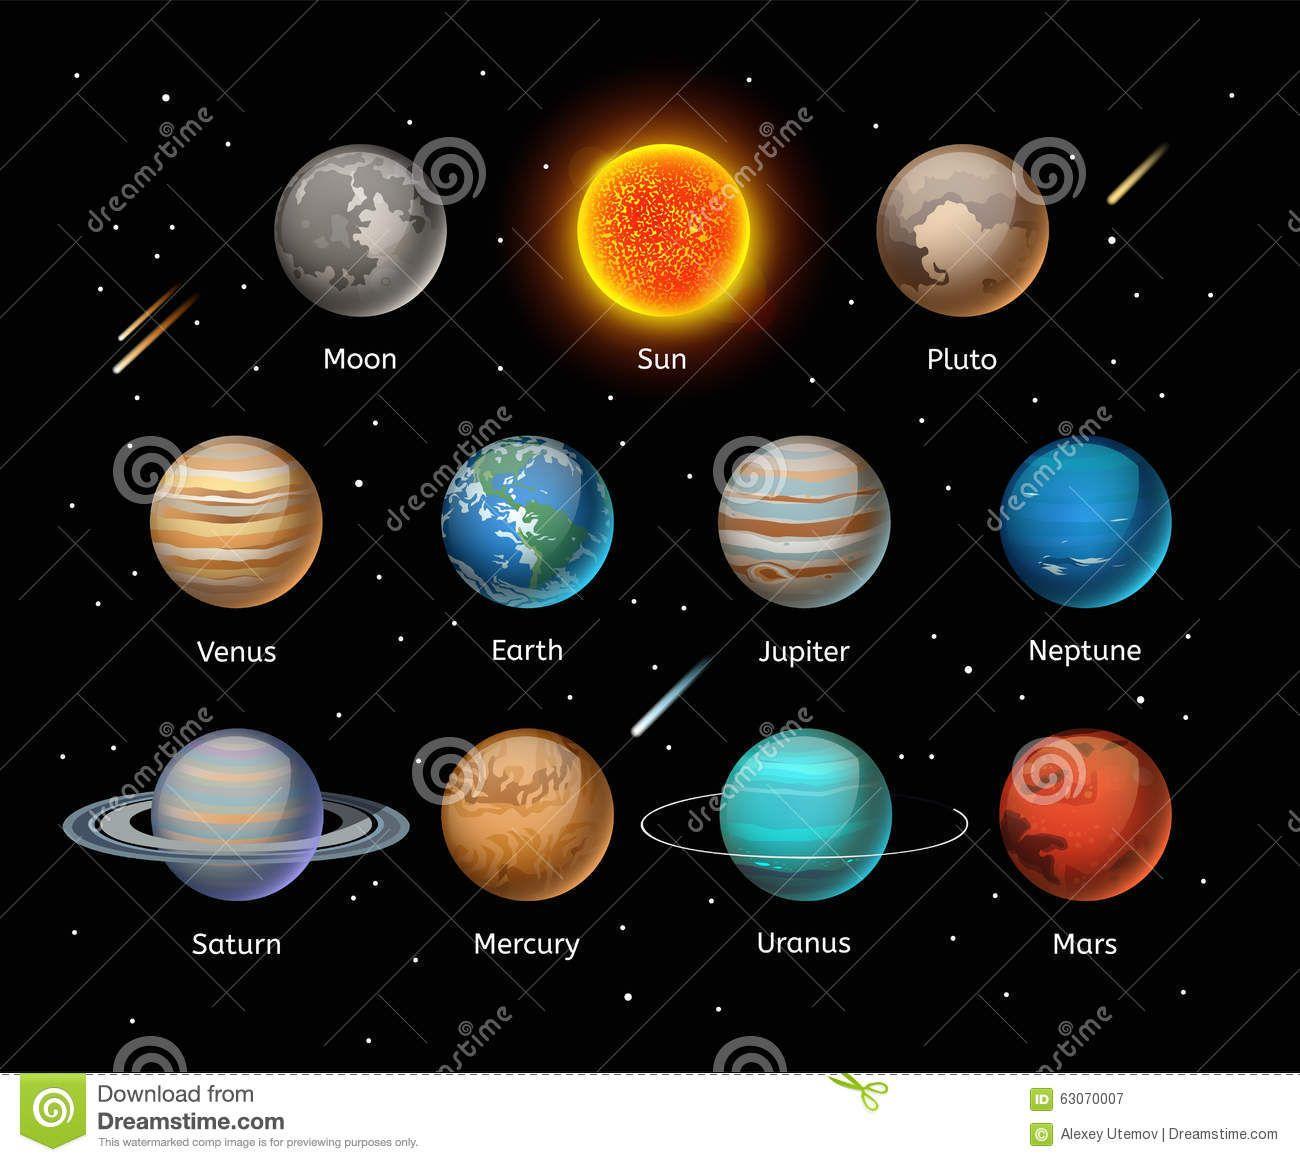 Planeten clipart orbit. Pin by morgan mason